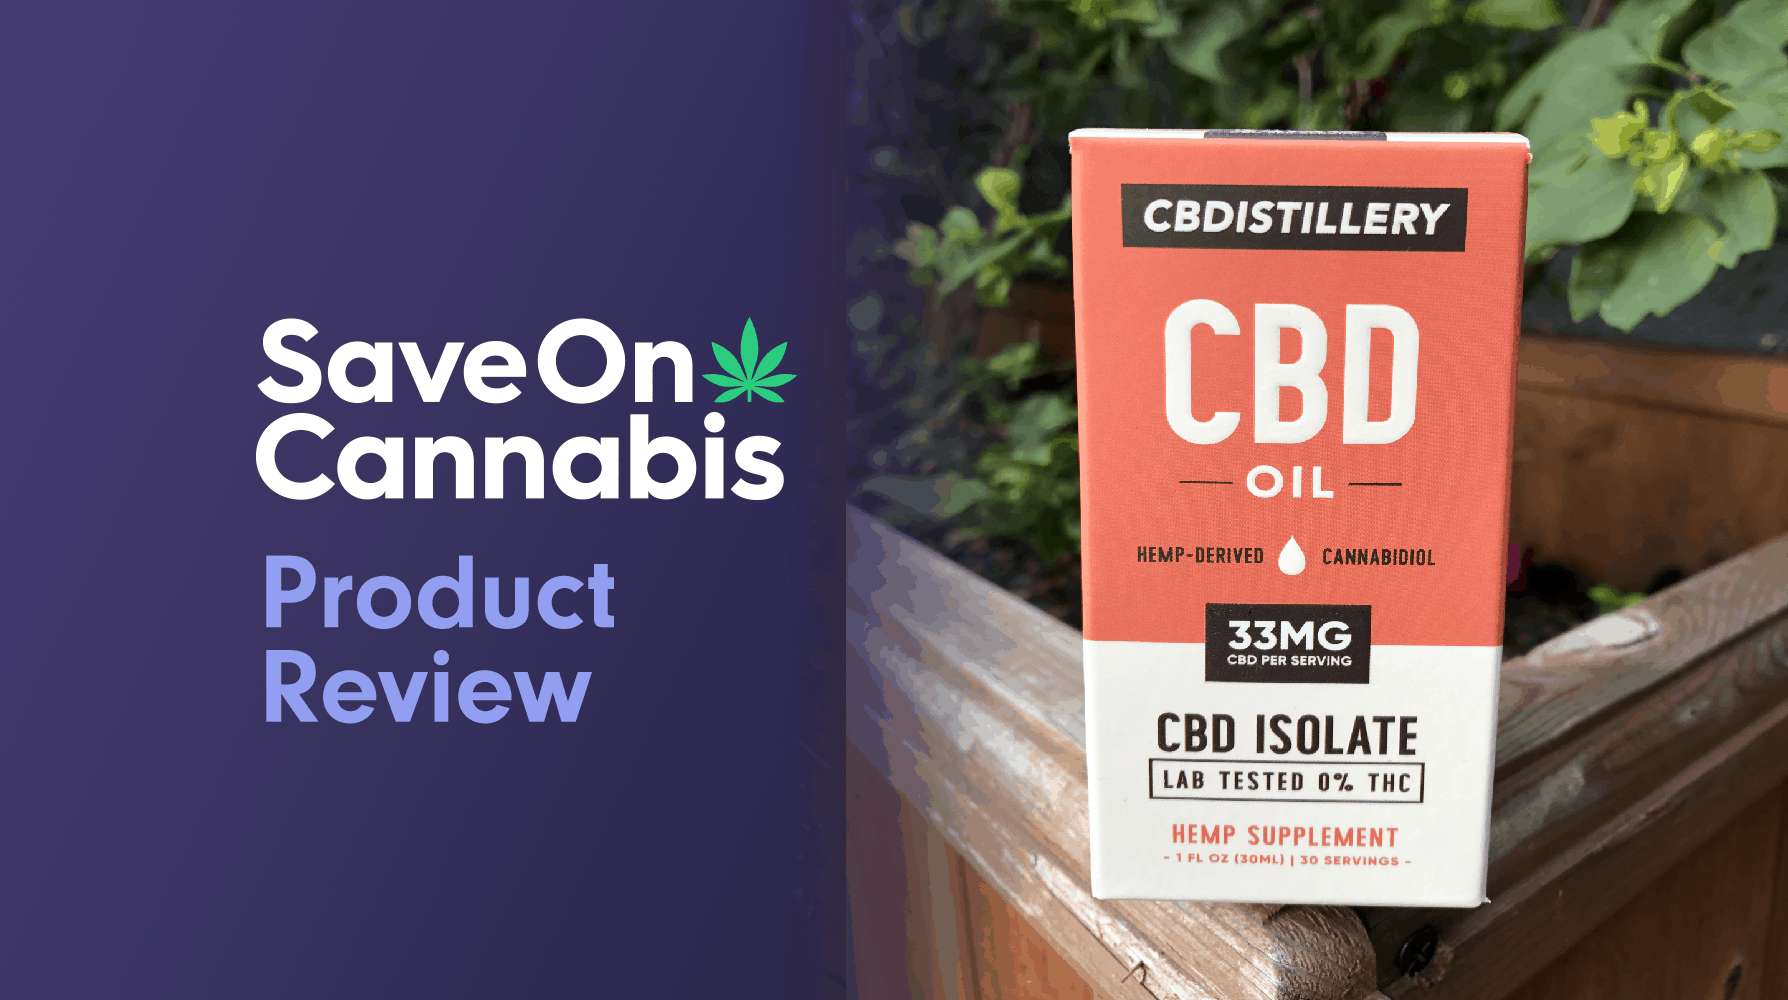 cbdistillery thc free pure cbd oil tincture 1000 mg save on cannabis website